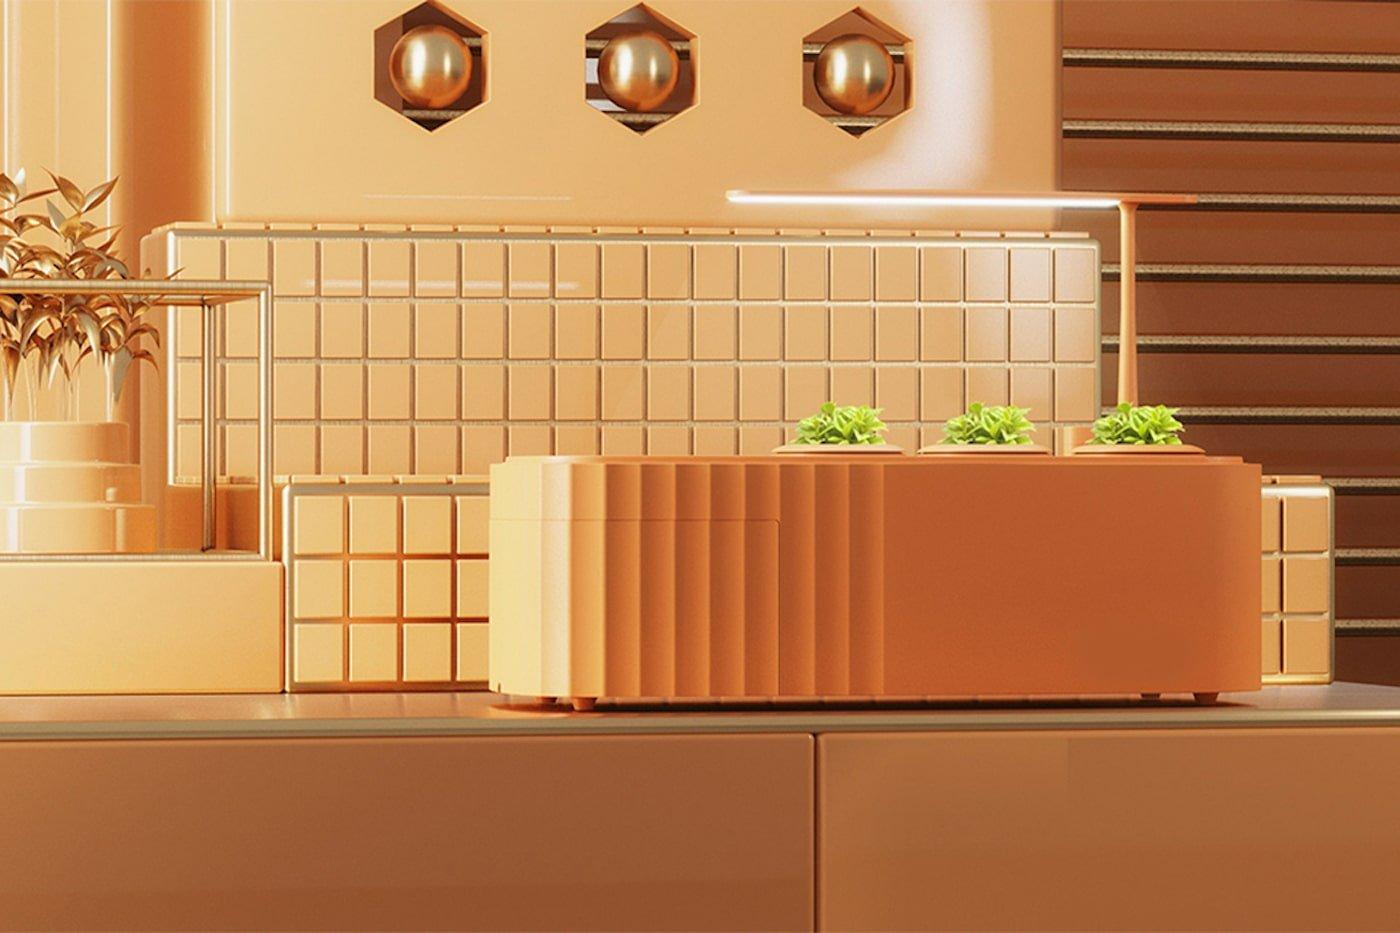 Orange counter top compost unit and garden planter